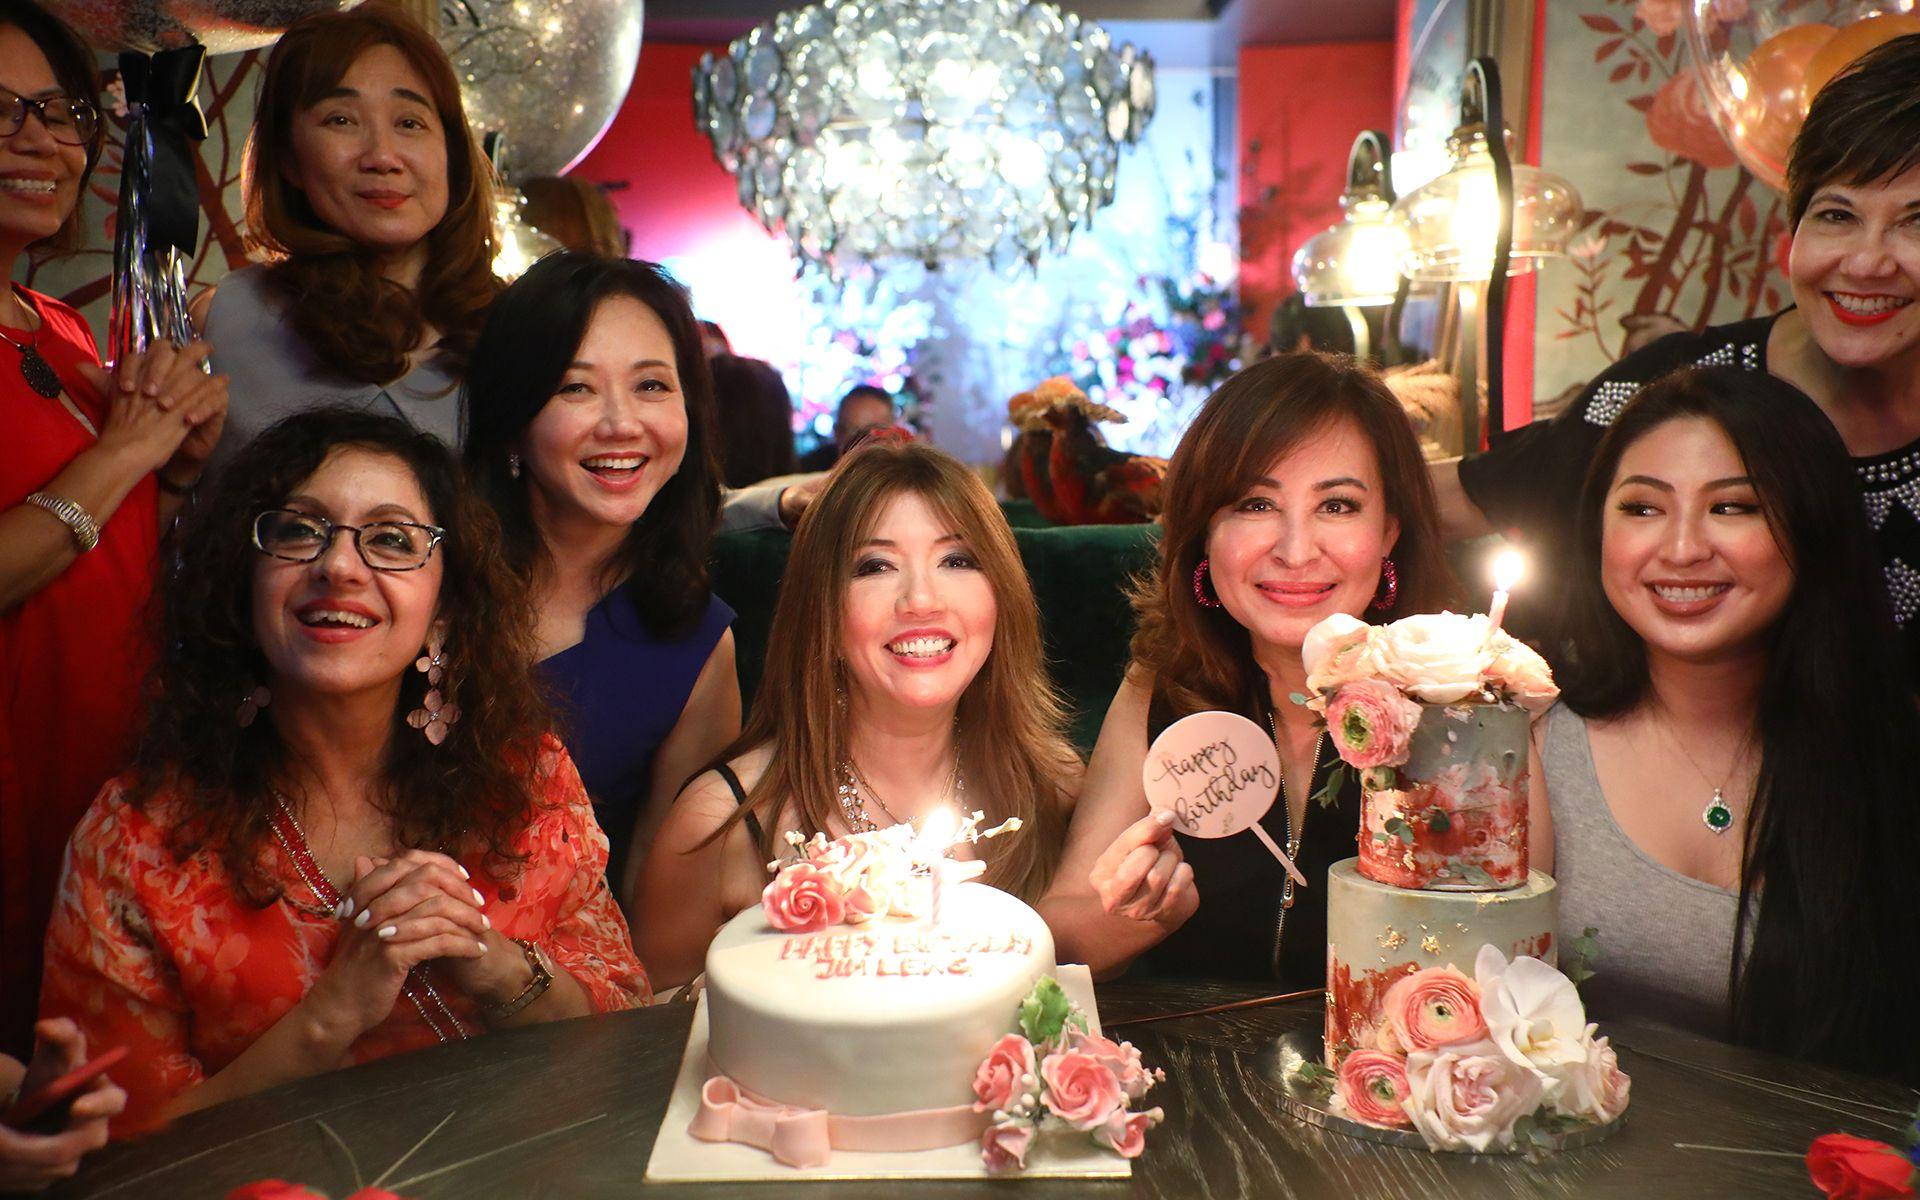 Elakumari Kantilal, Anna Cheng, Kiran Jeyabalan, Dato' Kong Sooi Lin, Lee Jim Leng, Vivienne Cheng, Jasiminne Yip and Alice Yong